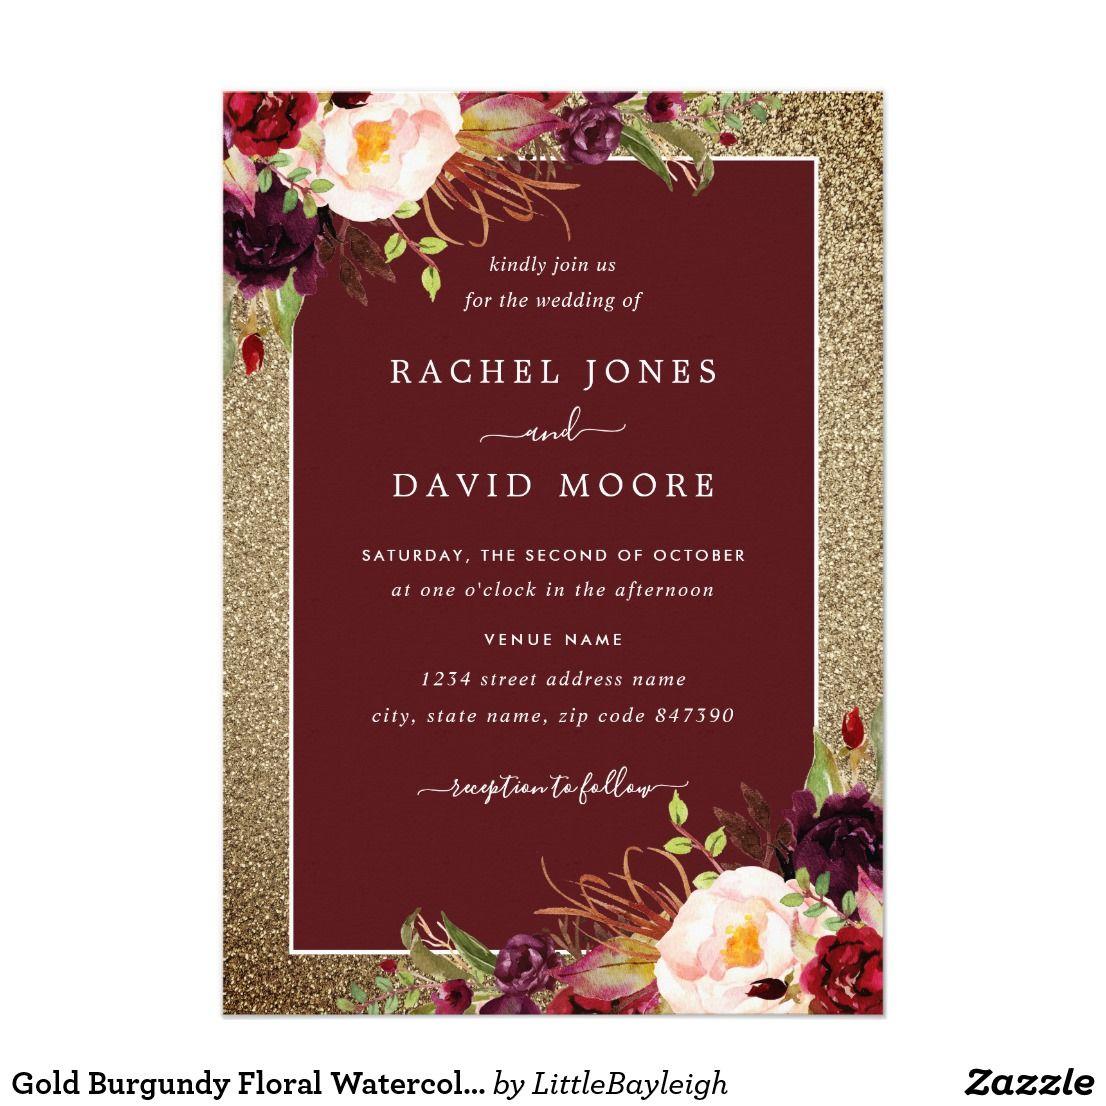 Gold Burgundy Floral Watercolor Wedding Invite | Wedding | Pinterest ...